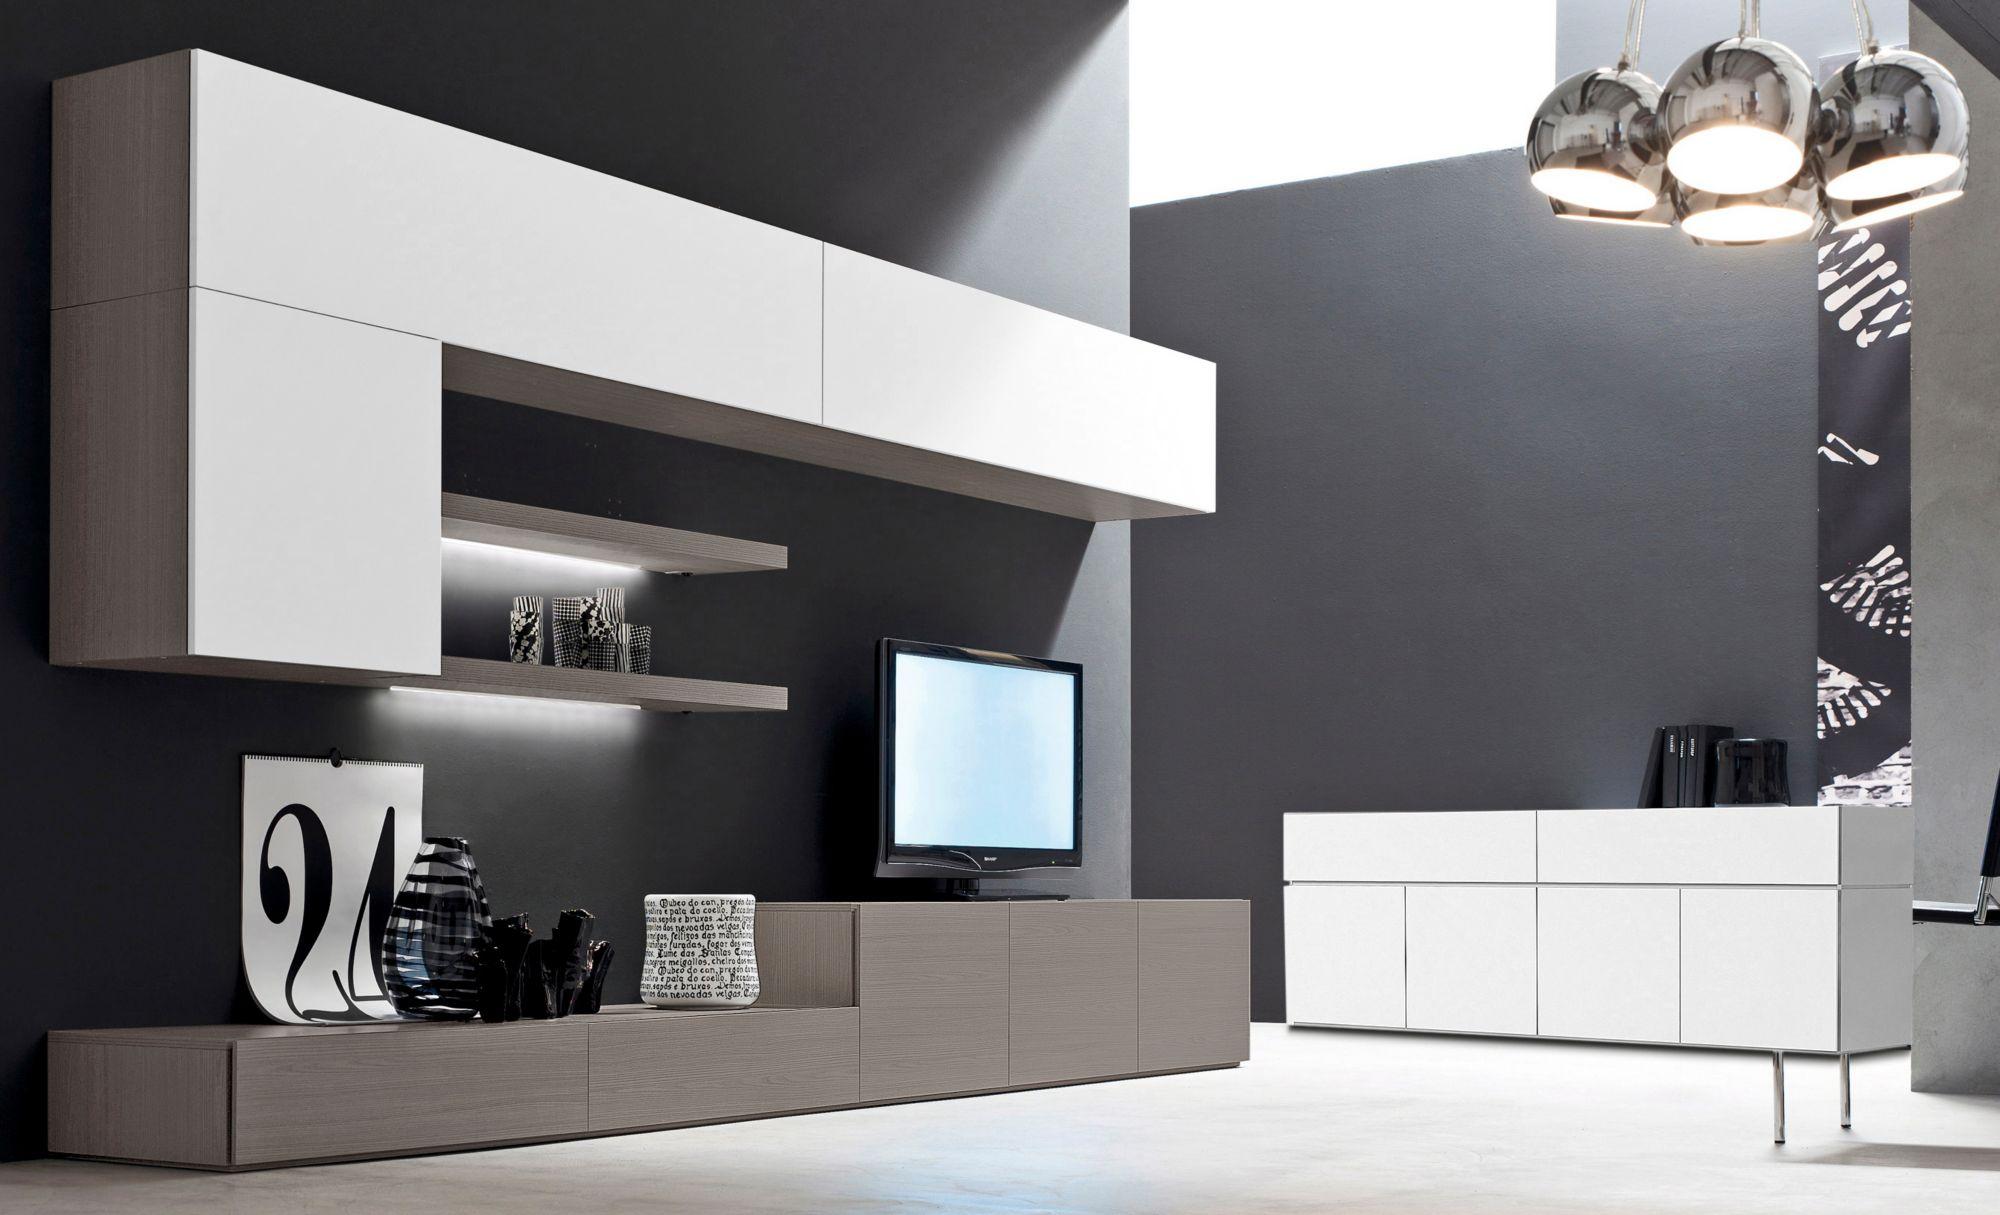 italian design im schwab online shop m bel wohnw nde. Black Bedroom Furniture Sets. Home Design Ideas